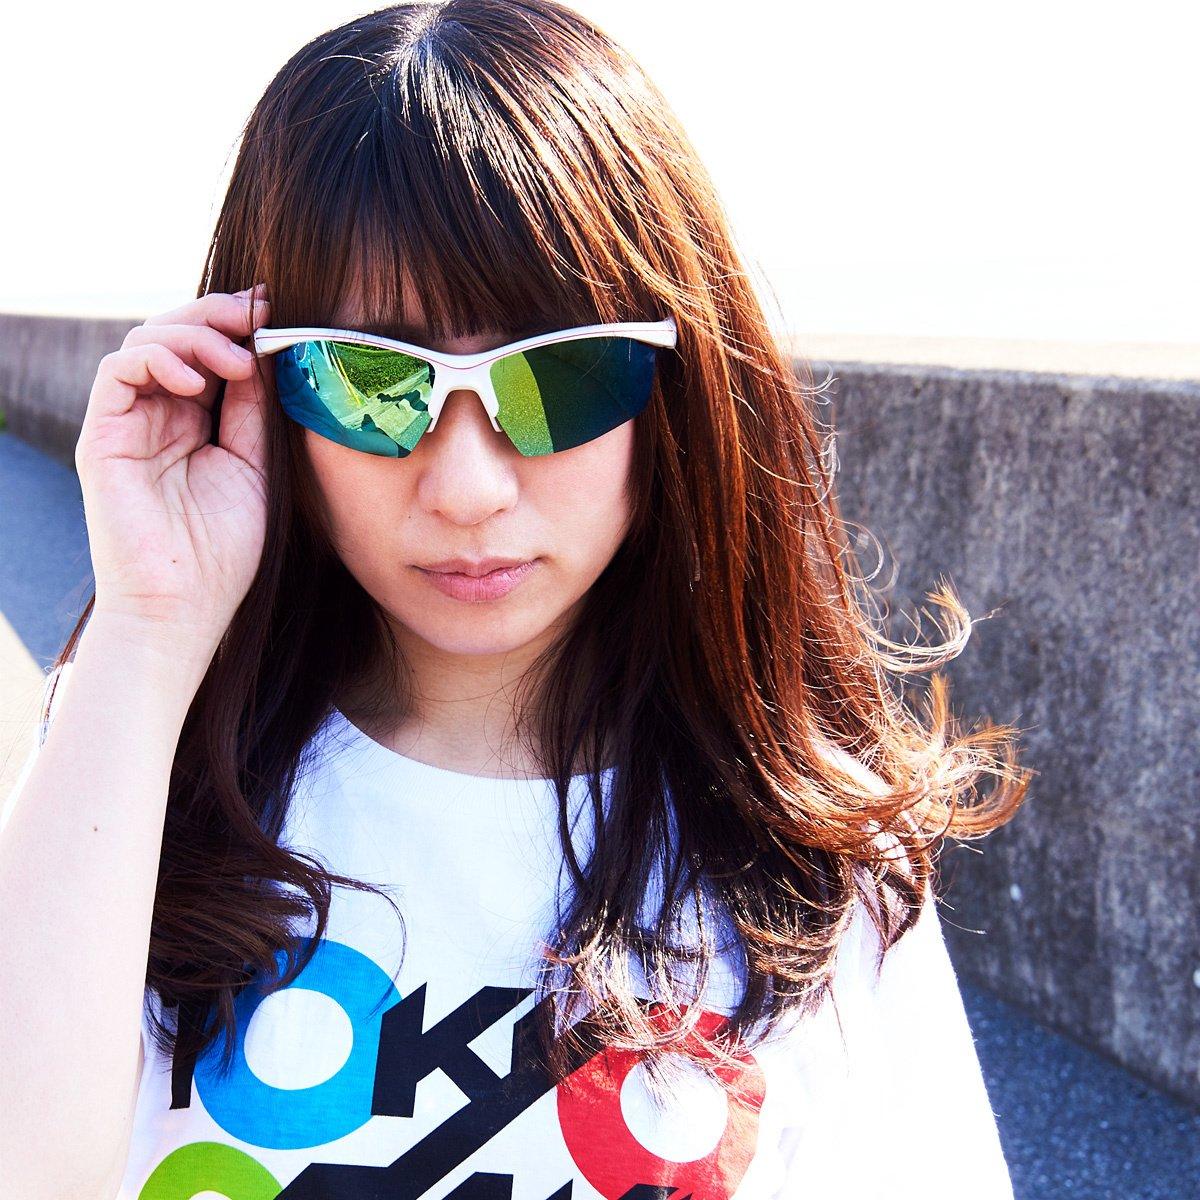 up23.jp girl Racing Miku 2014 Ver. Glasses